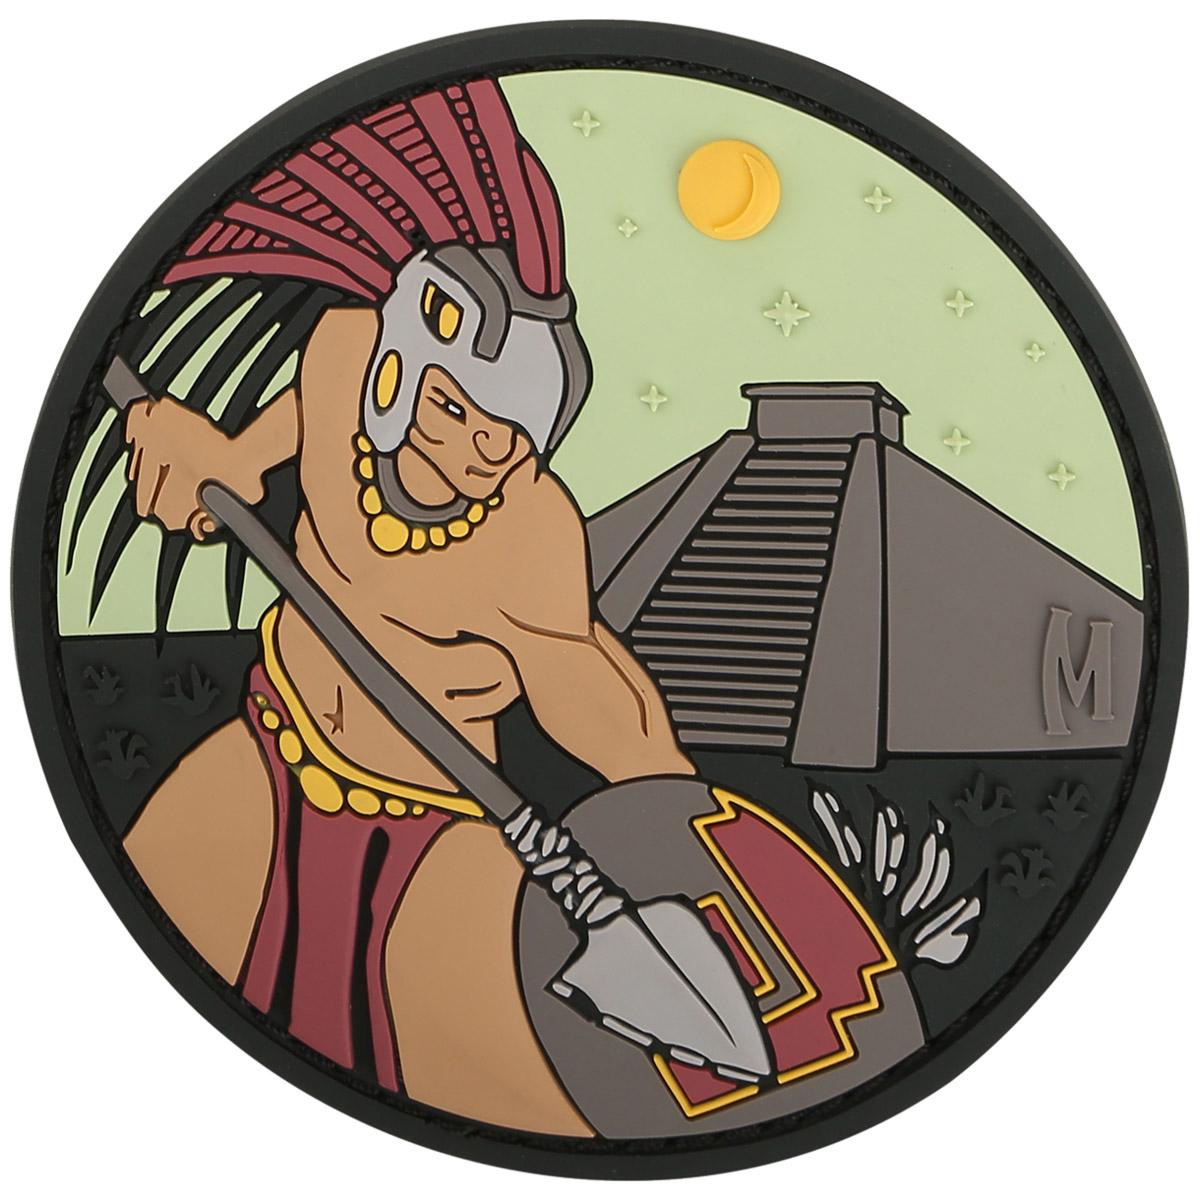 Maxpedition Aztec Warrior 3D PVC Hook Rubber Colour Heritage Cool Morale Patch